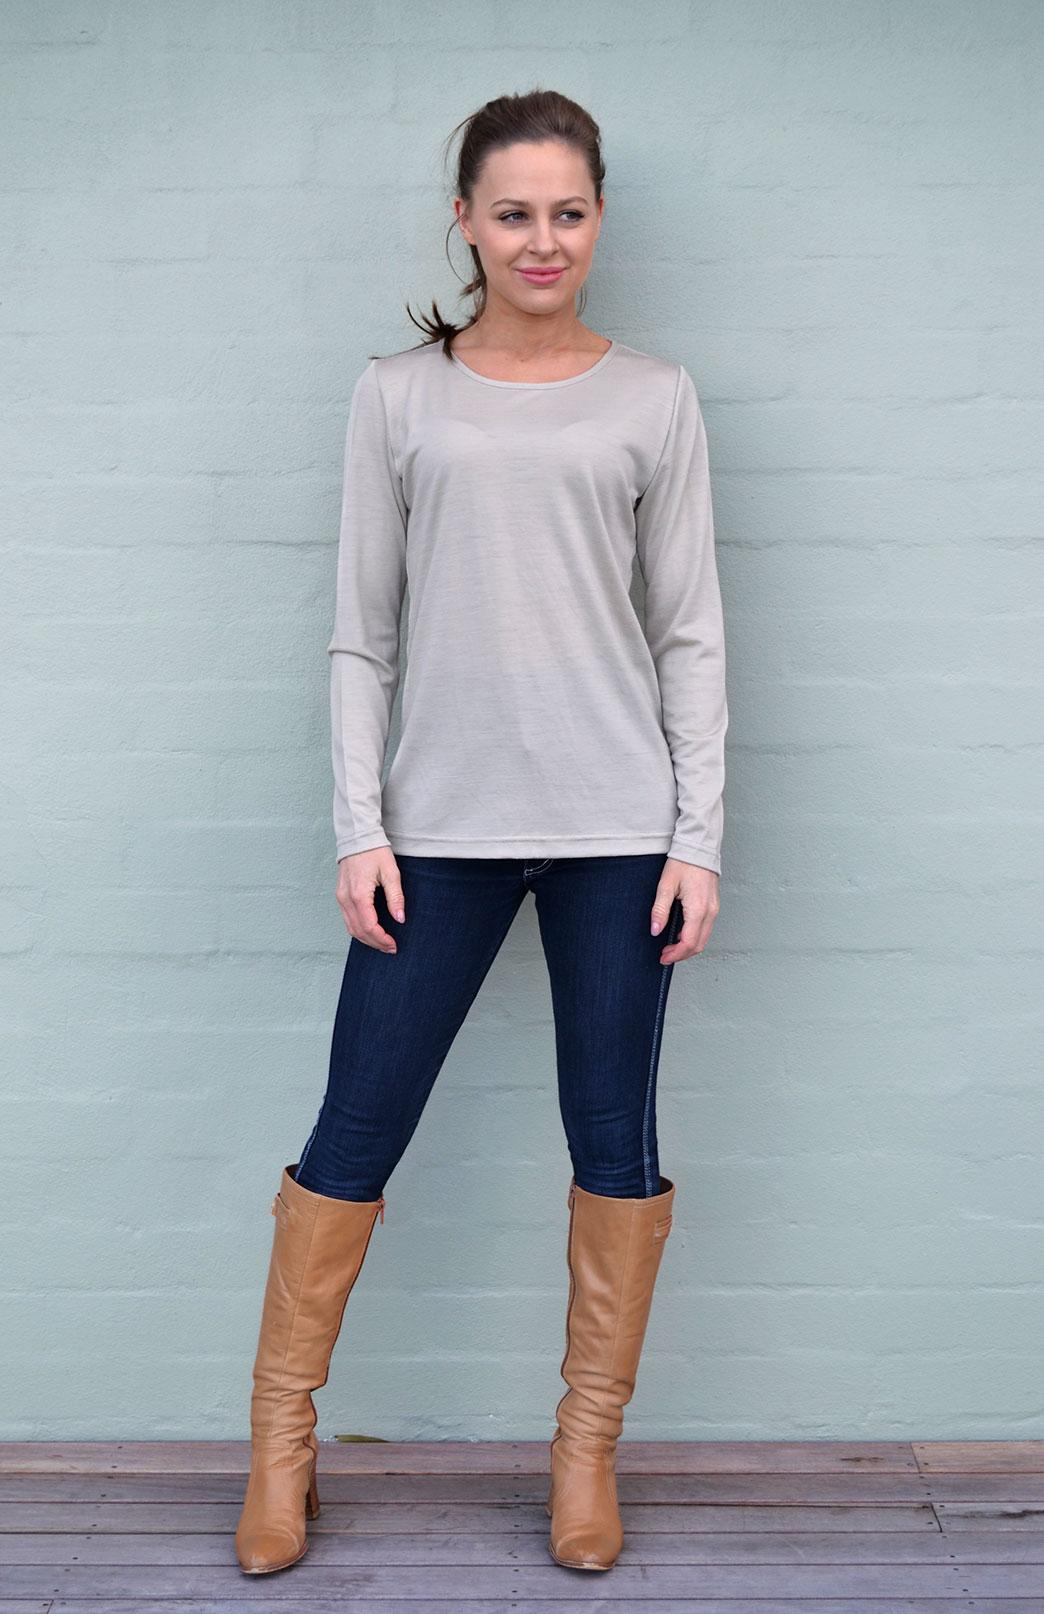 Round Neck Top - Plain - Women's Natural Raffia Long Sleeved Merino Wool Thermal Top - Smitten Merino Tasmania Australia